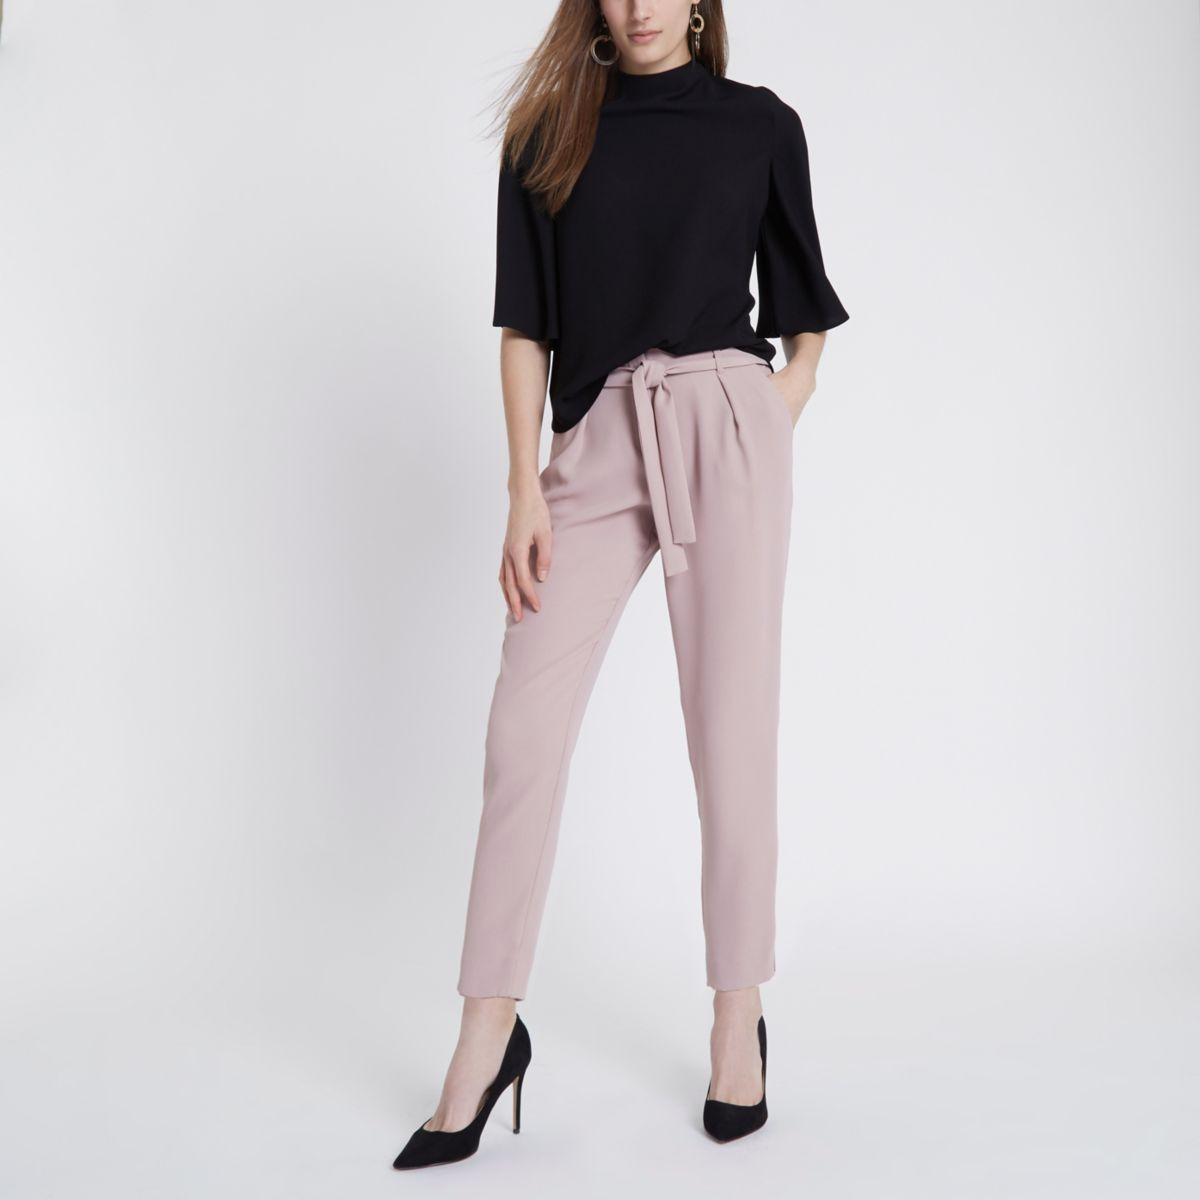 Light pink tie waist tapered pants